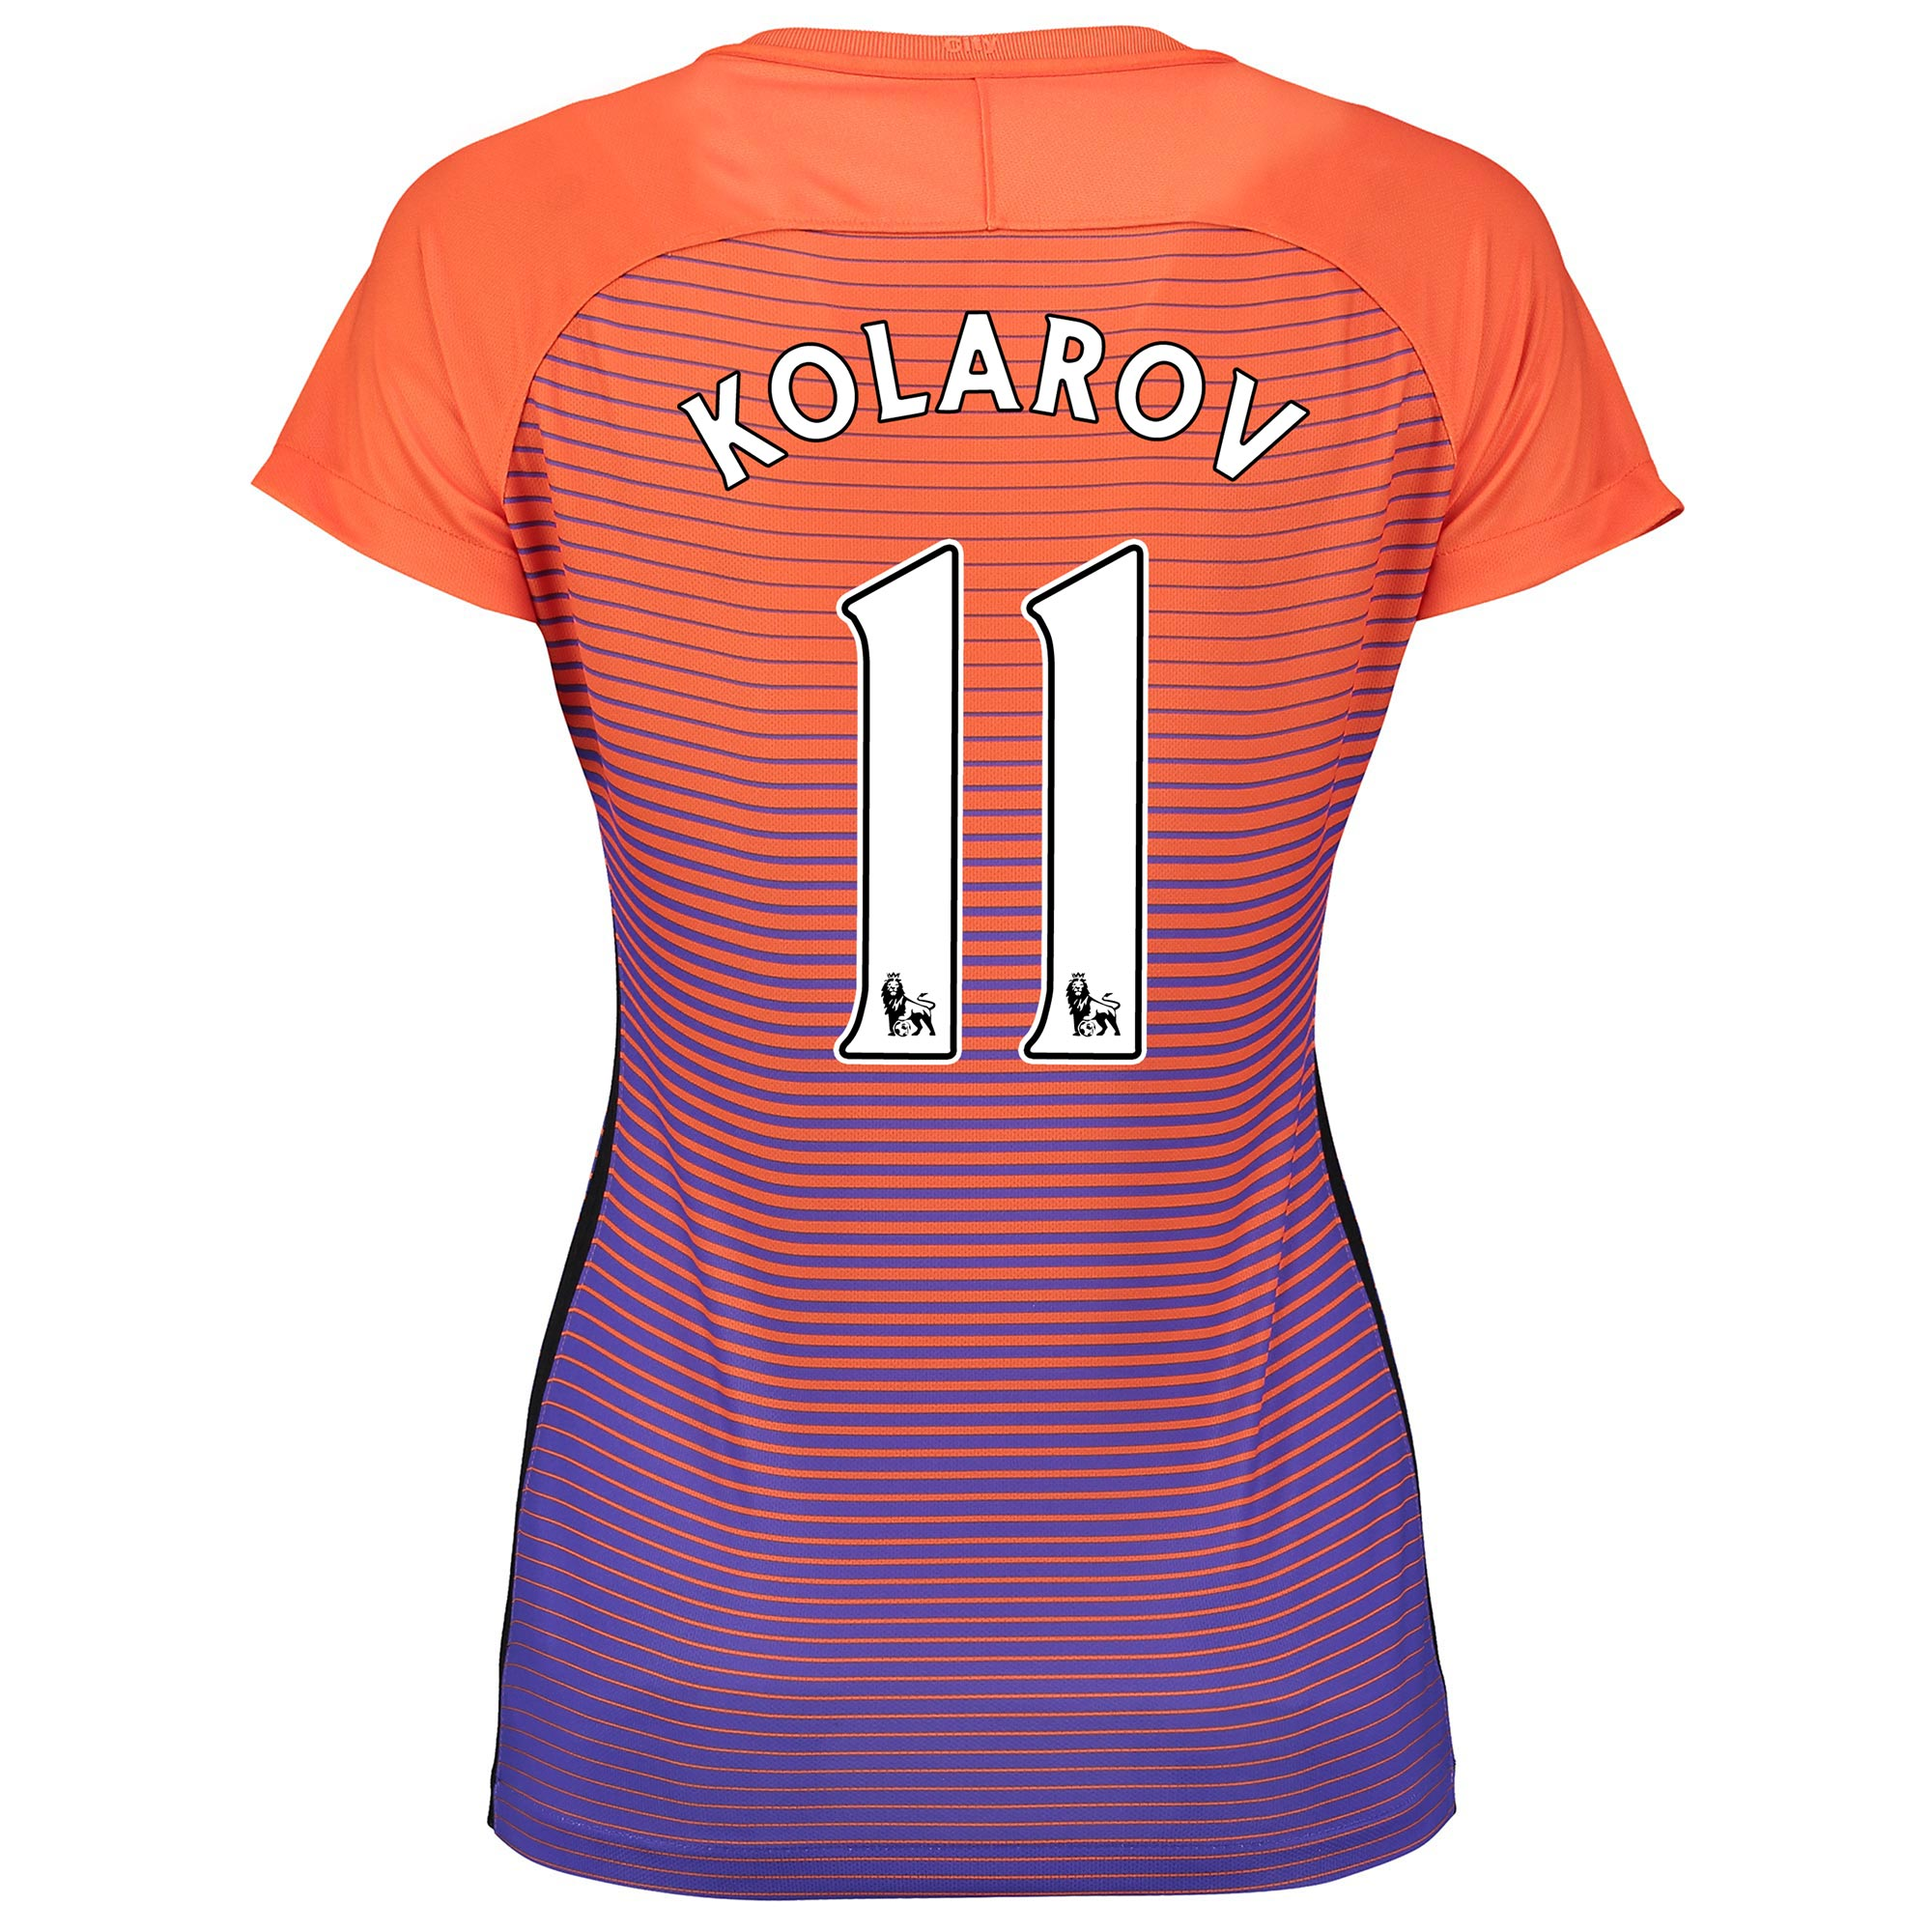 Manchester City Third Stadium Shirt 2016-17 - Womens with Kolarov 11 p